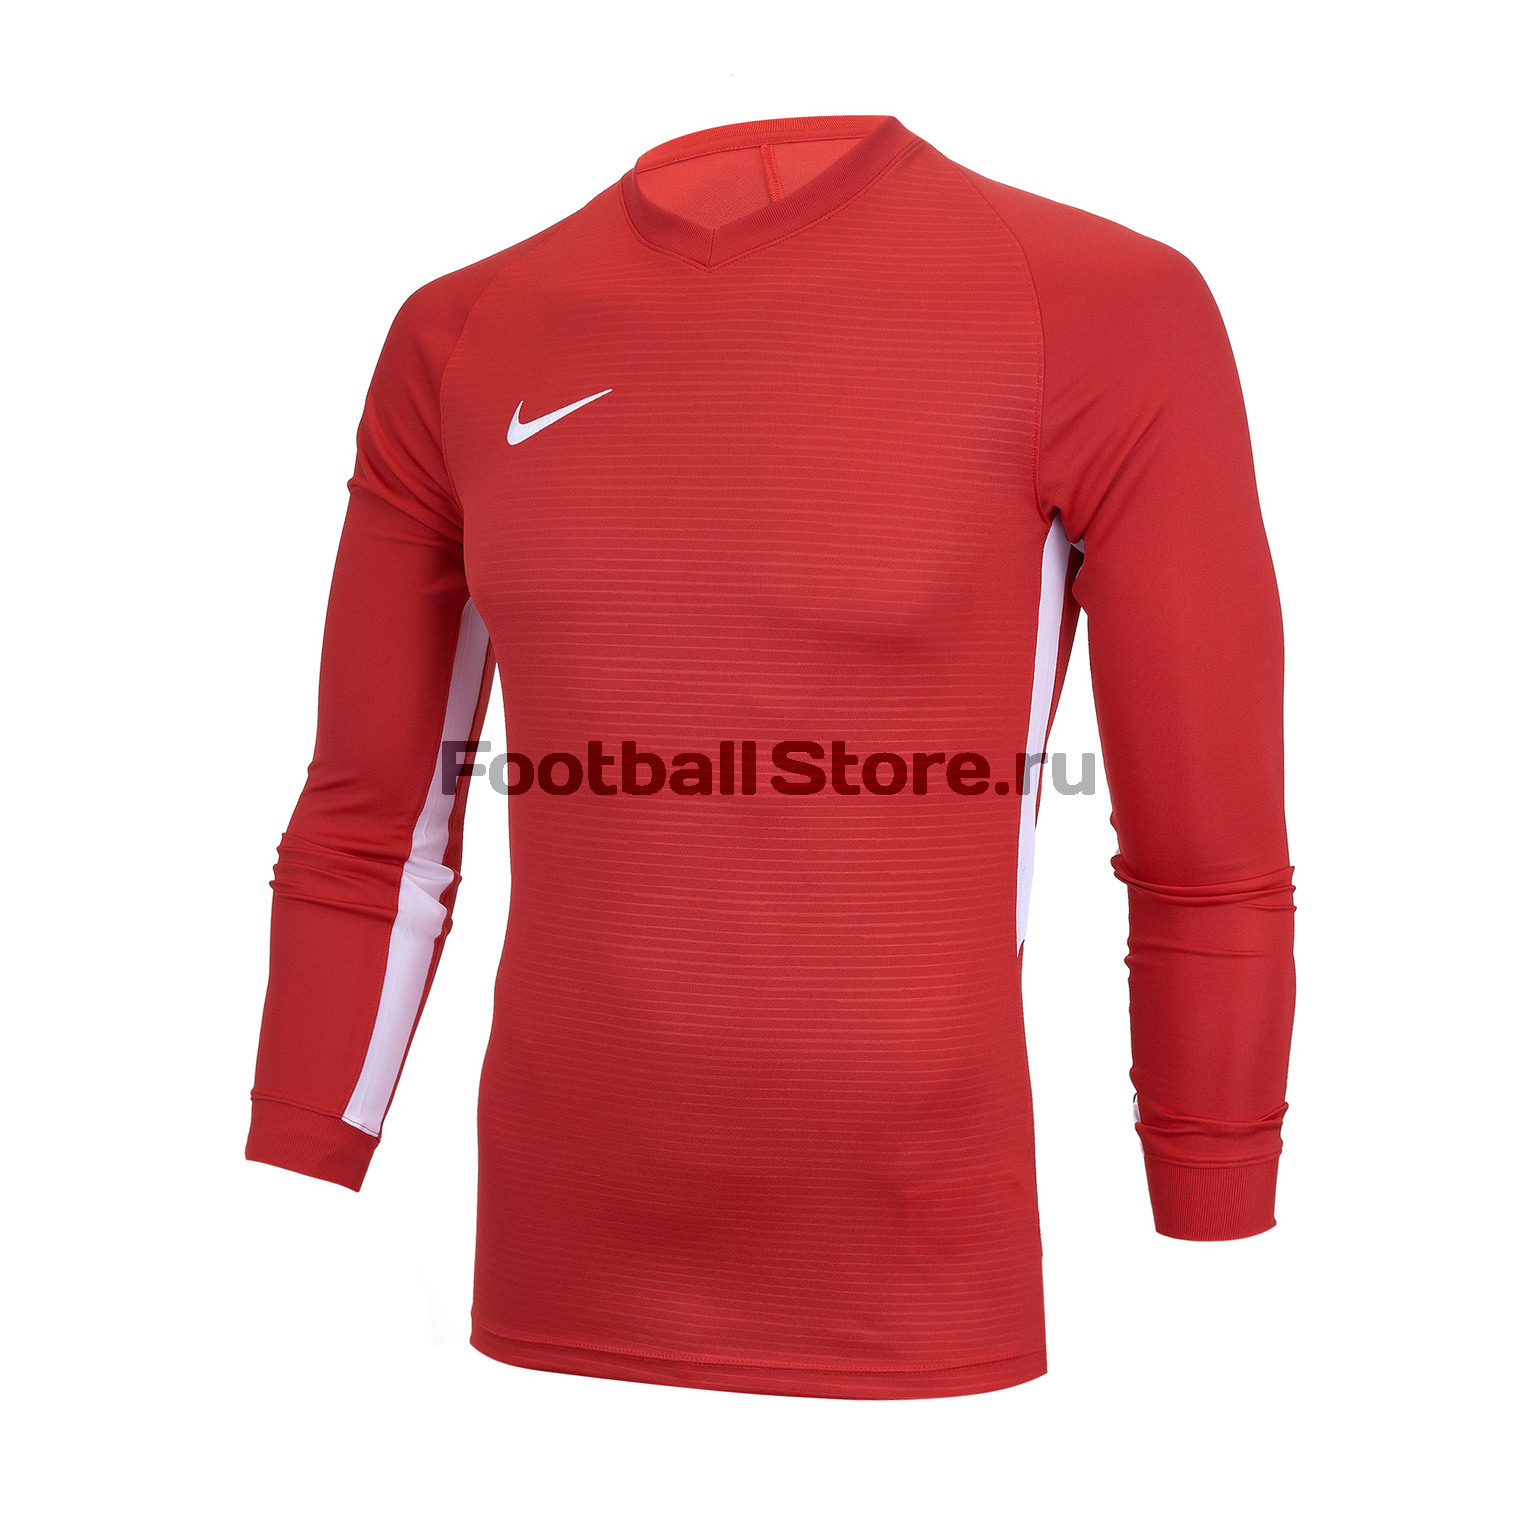 Футболка игровая Nike Dry Tiempo Prem JSY LS 894248-657 футболка игровая nike dry tiempo prem jsy ss 894230 463